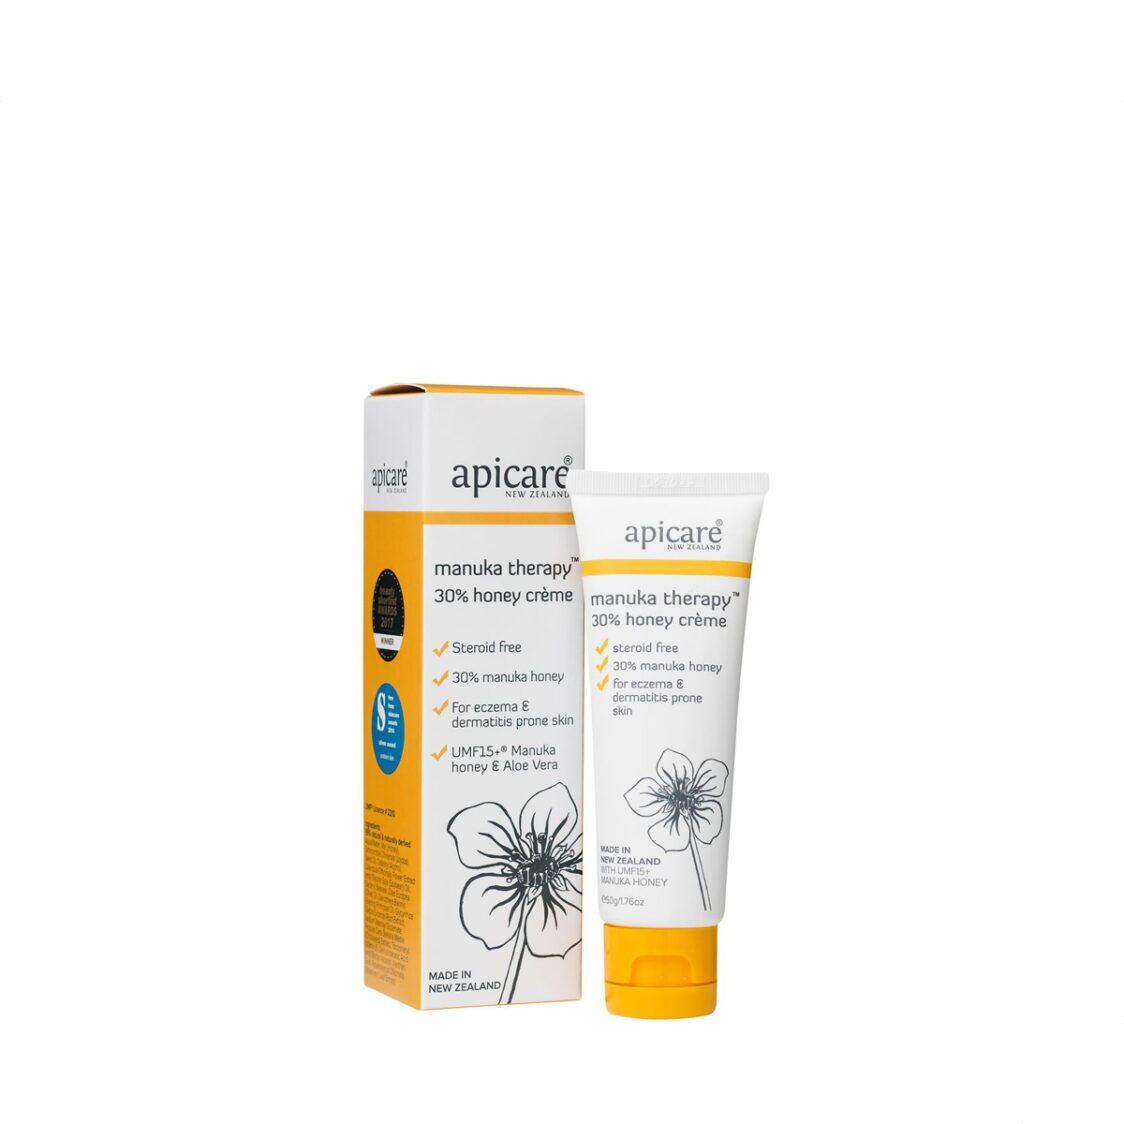 Apicare Manuka Therapy 30 Honey Skin Crme 50g